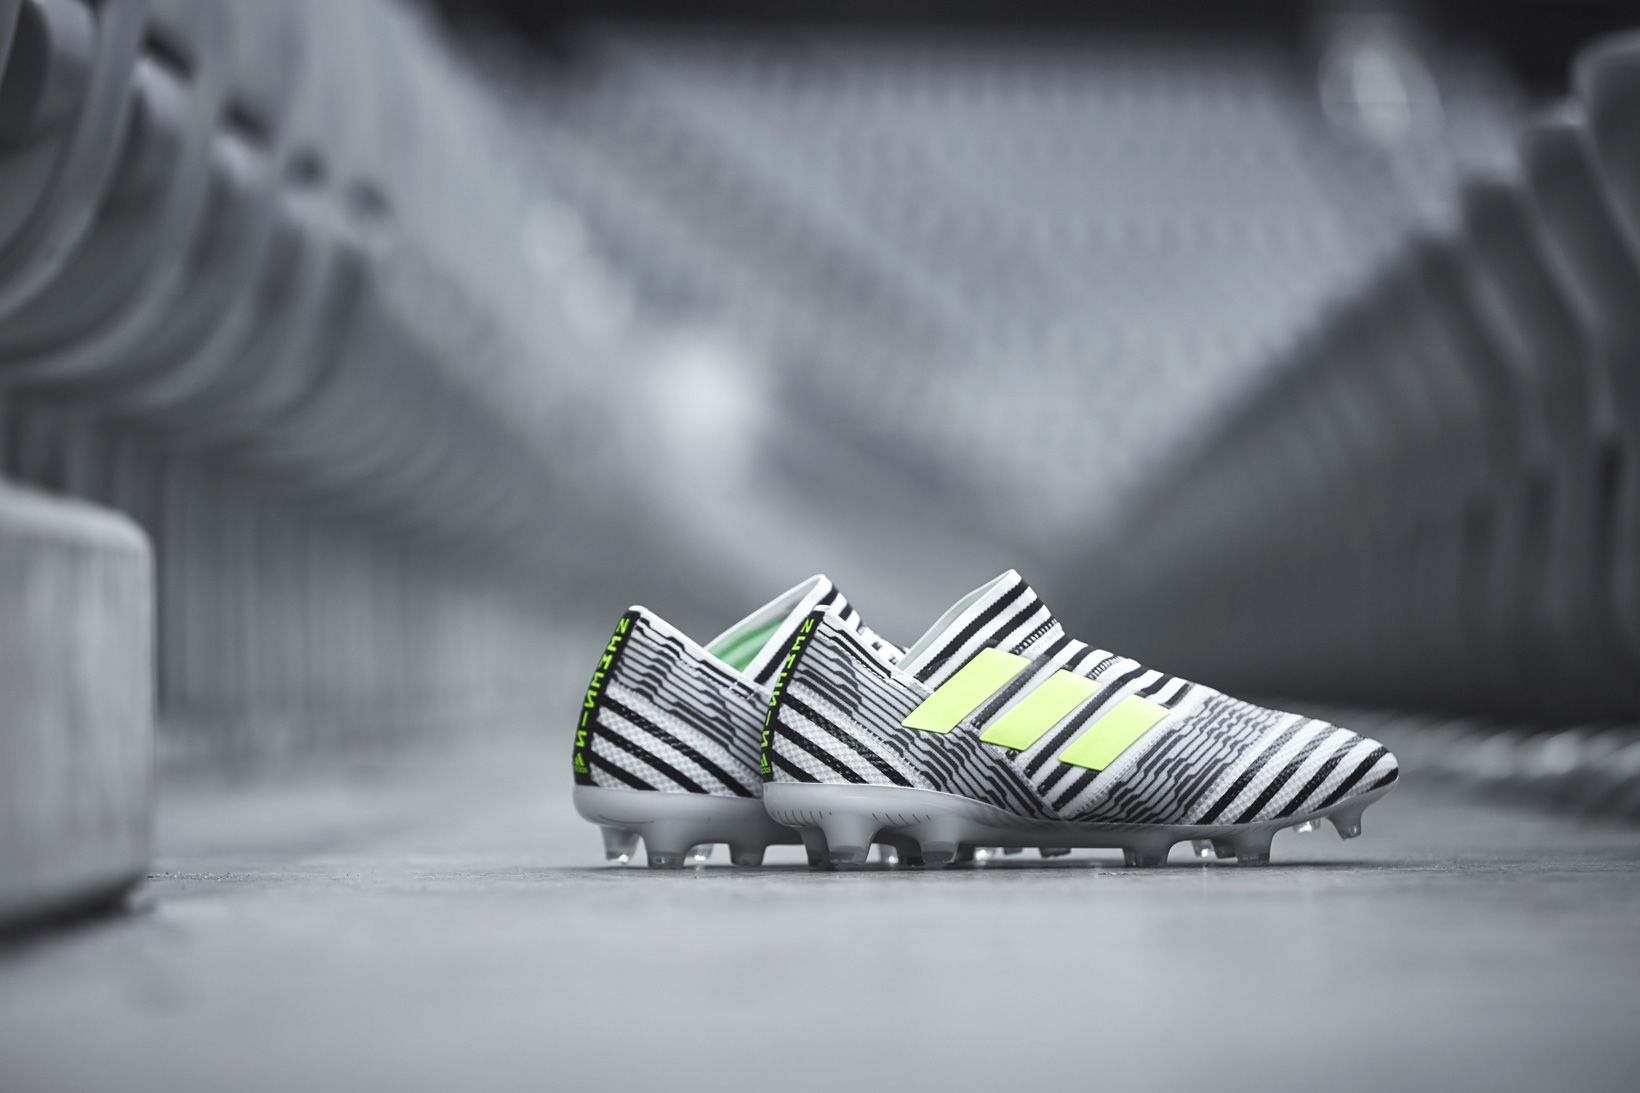 Adidas Messi Nemesis Football Boot | Botines futbol, Botas